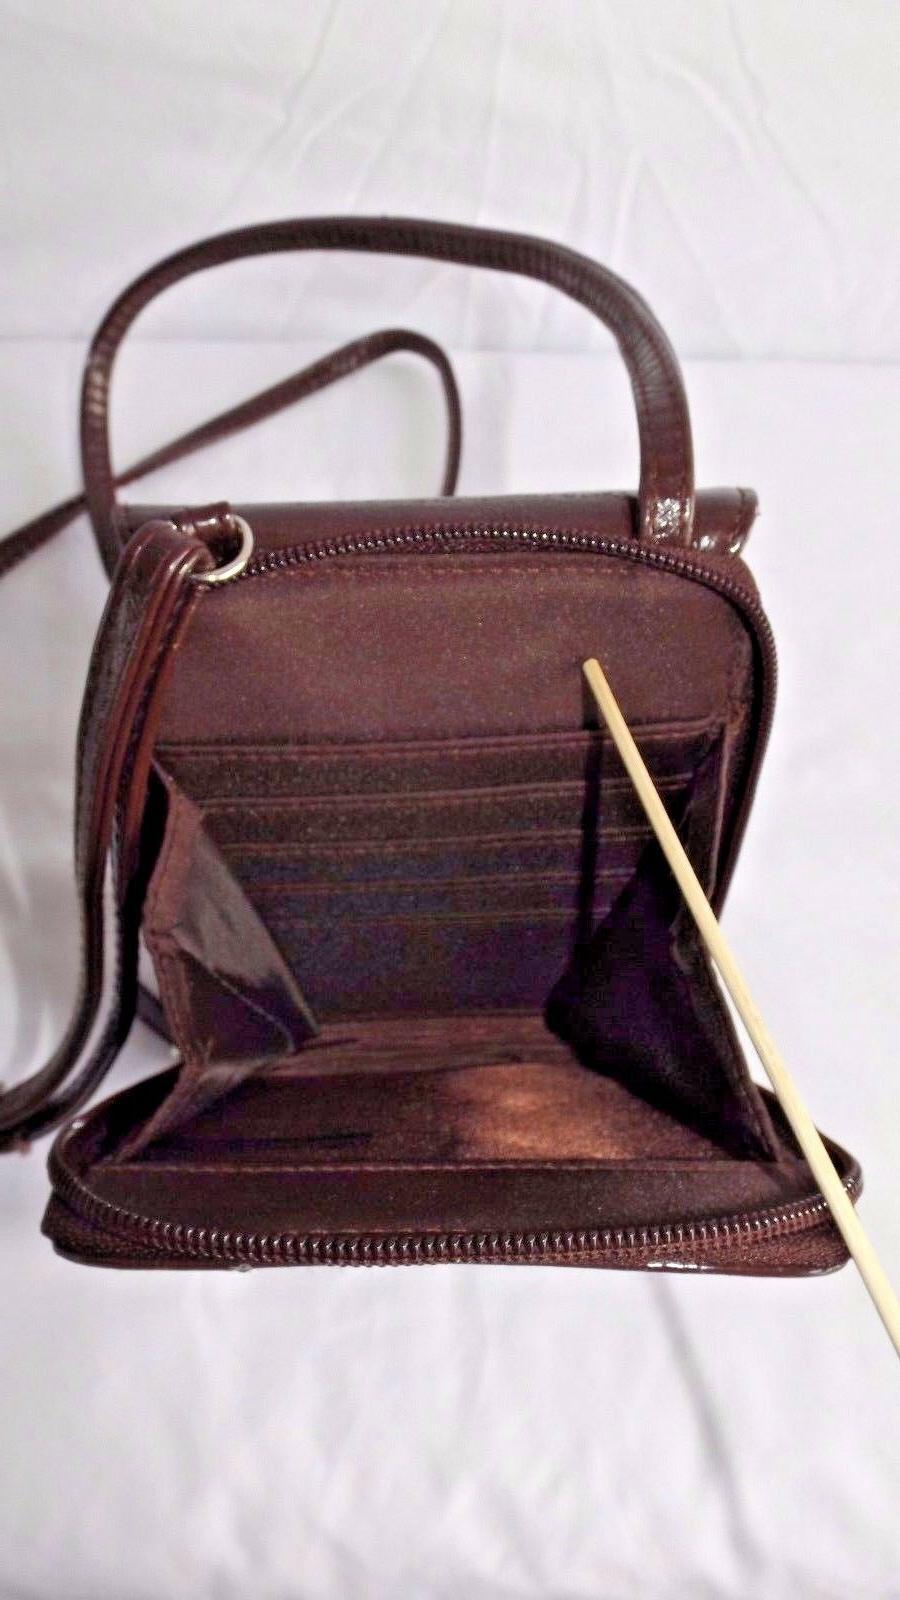 Mundi Bag, Brown Faux Patent Leather, NWOTS